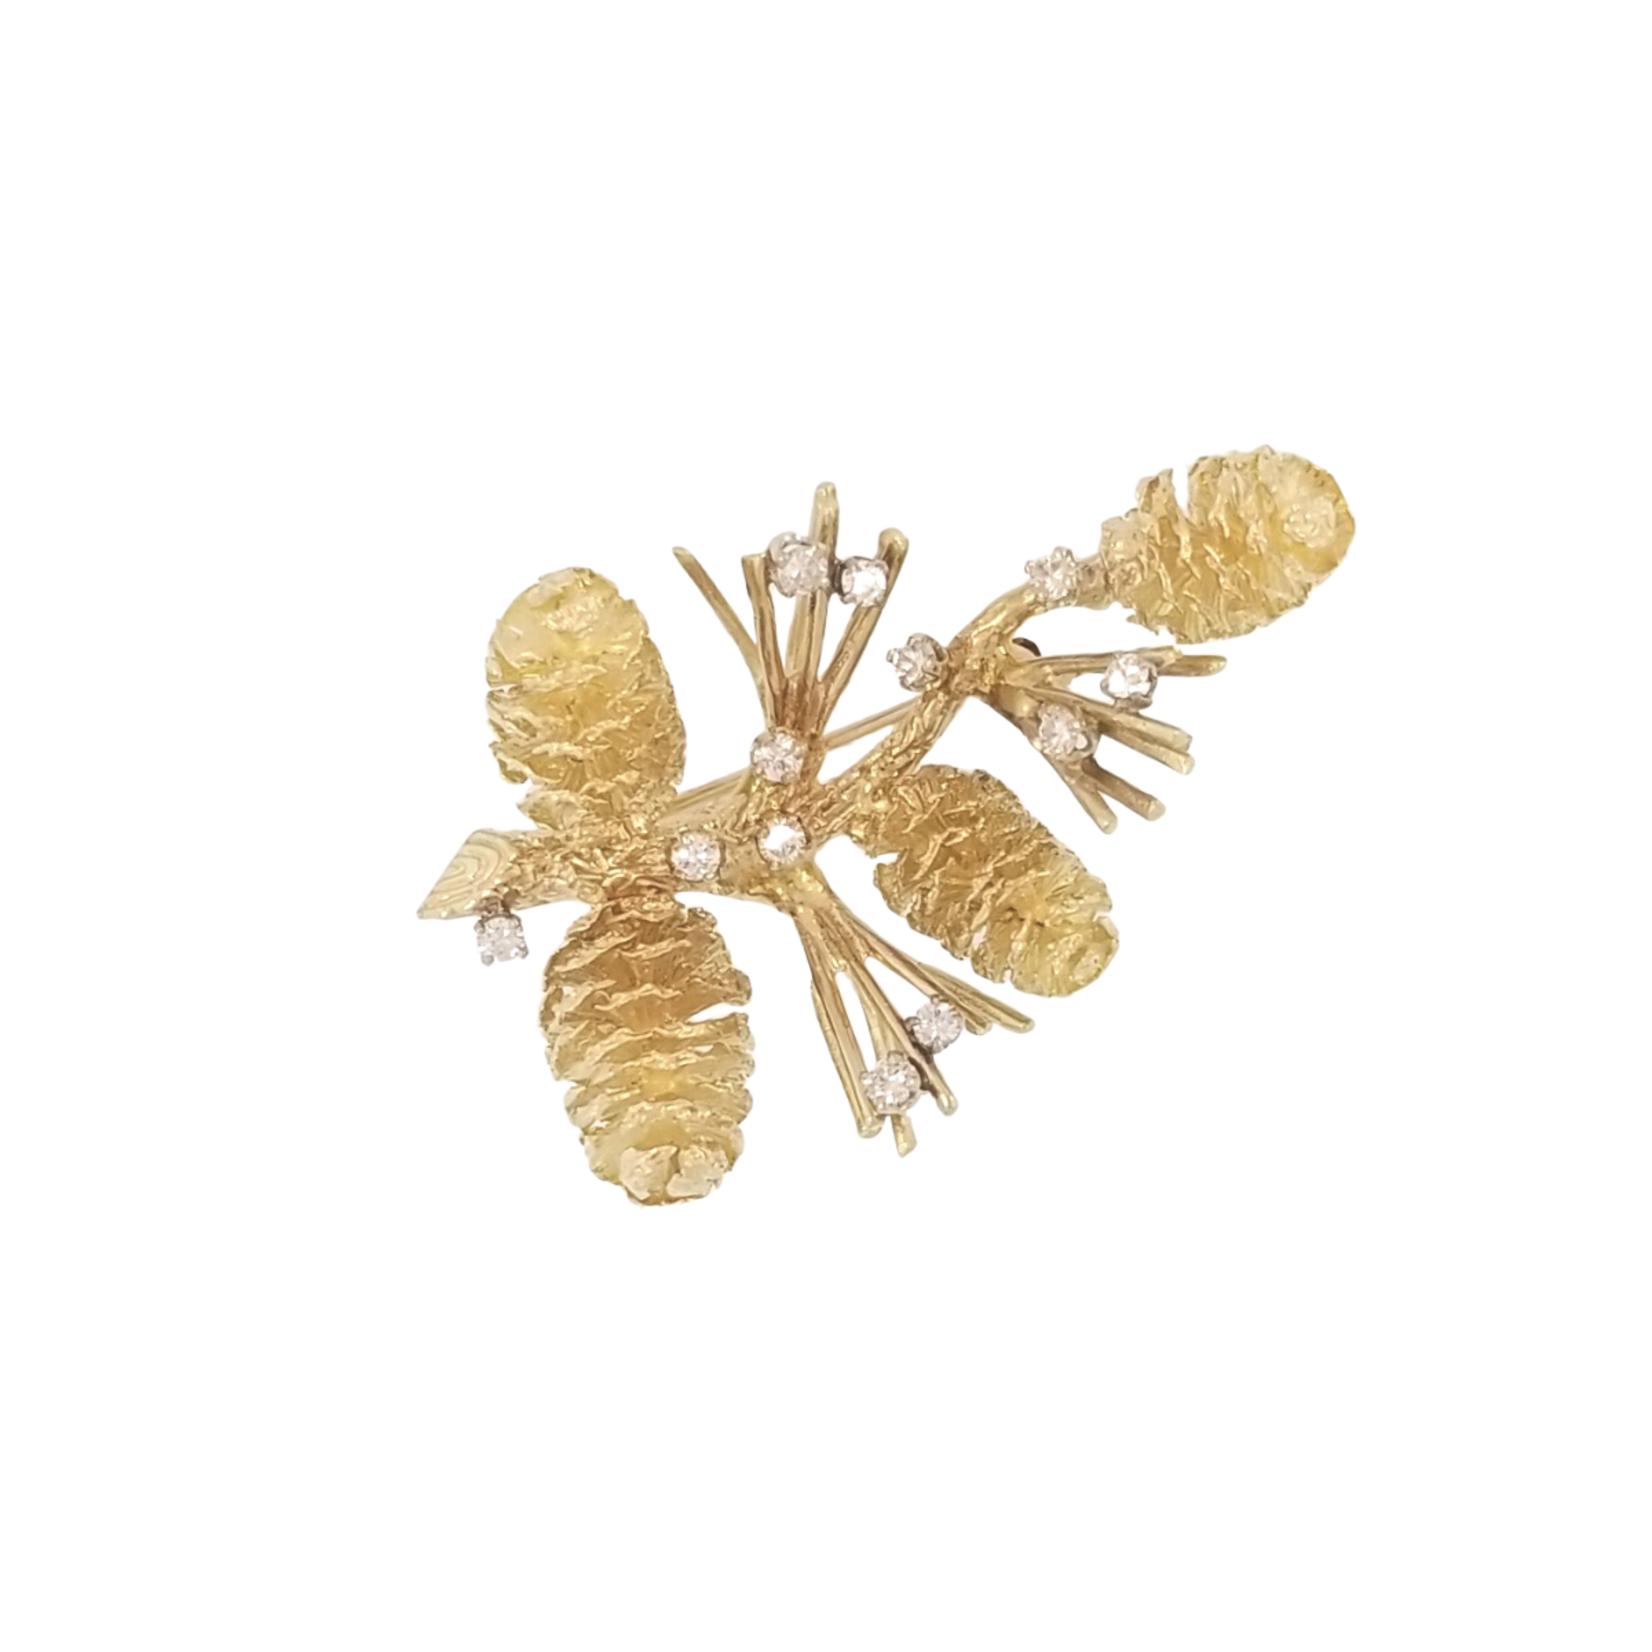 Estate Gold & Diamond Pinecone Brooch